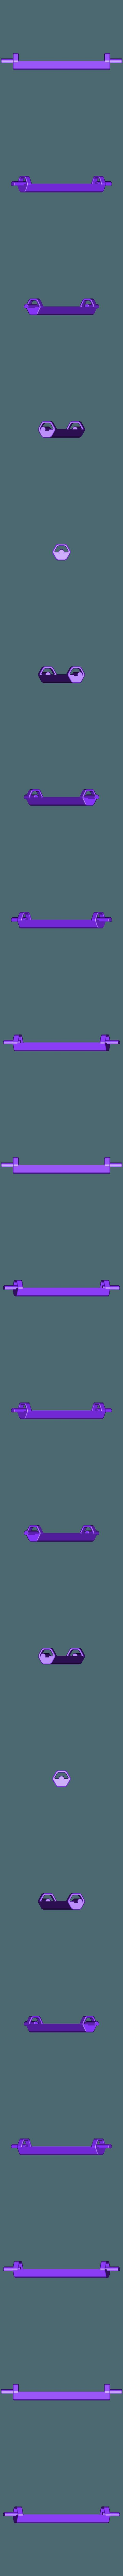 Tray 3.stl Download free STL file Clockwork pen carousel • 3D printing template, EvolvingExtrusions